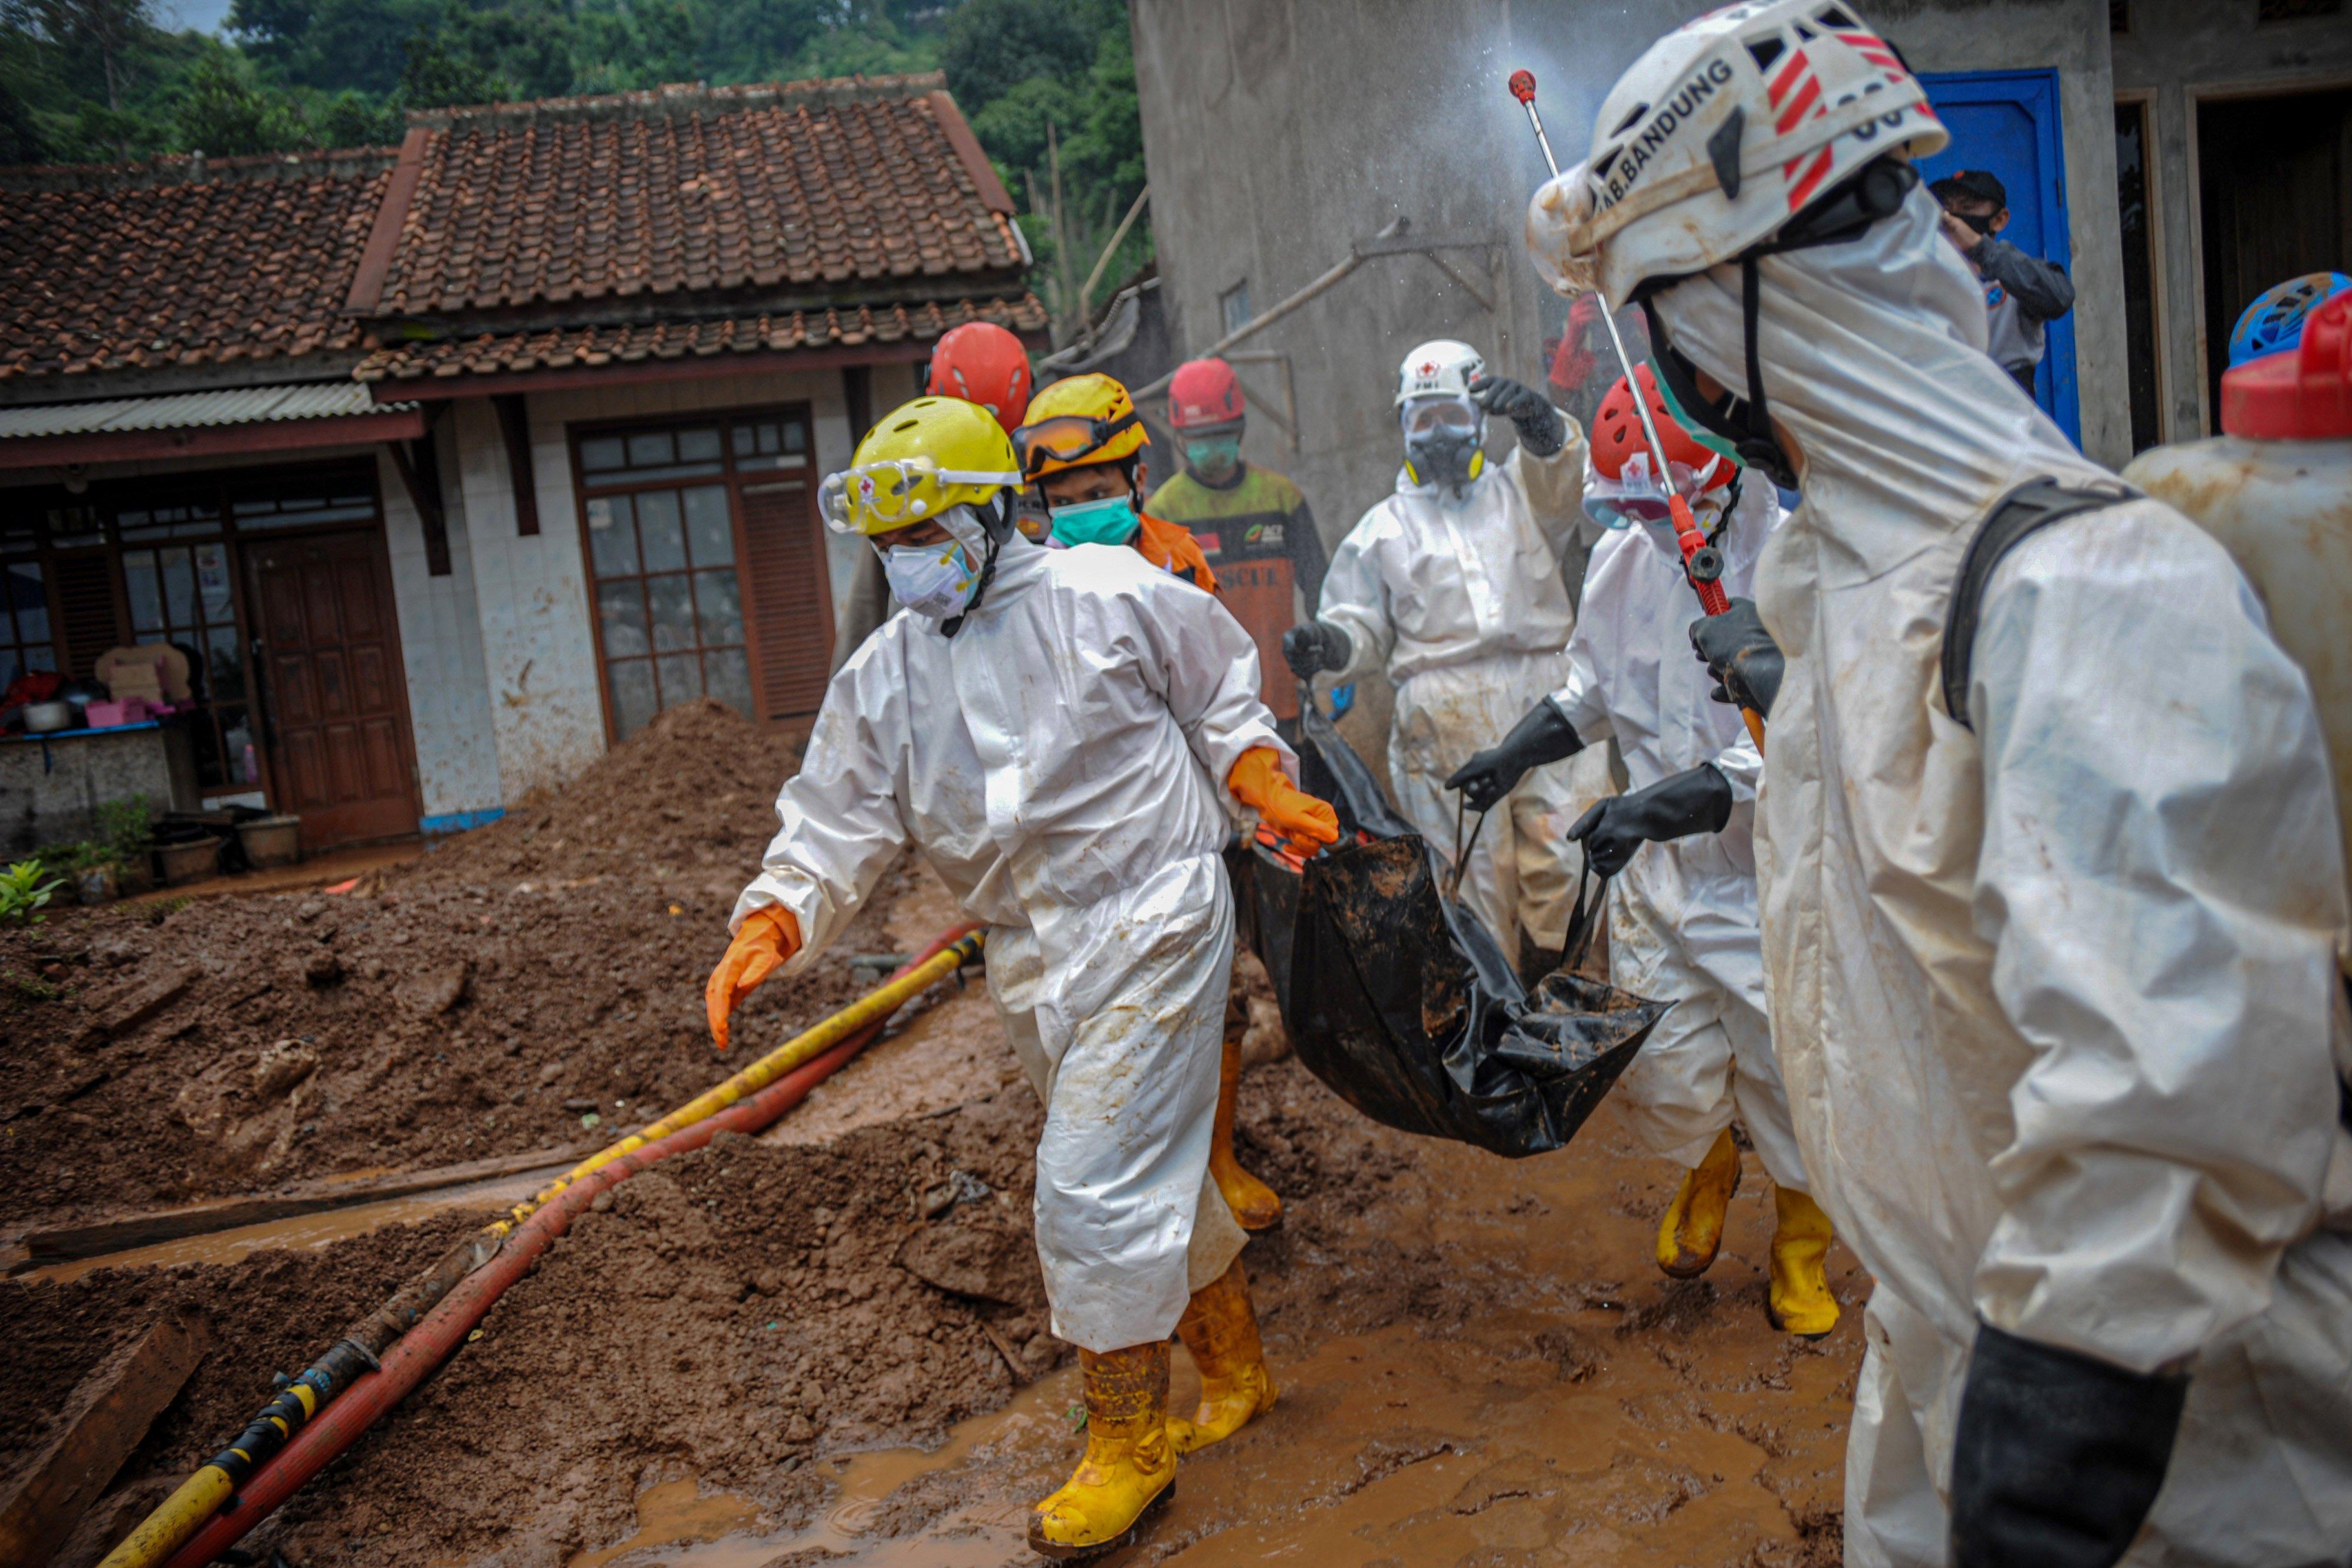 Petugas PMI Kabupaten Sumedang membawa jenazah korban bencana tanah longsor di Cimanggung, Kabupaten Sumedang, Jawa Barat, Kamis (14/1/2021). Hingga siang hari di hari keenam pencarian, tim SAR gabungan telah menemukan 24 korban bencana tanah longsor yang terjadi pada Sabtu (9/1) lalu, sementara 16 korban lainnya masih dalam pencarian.